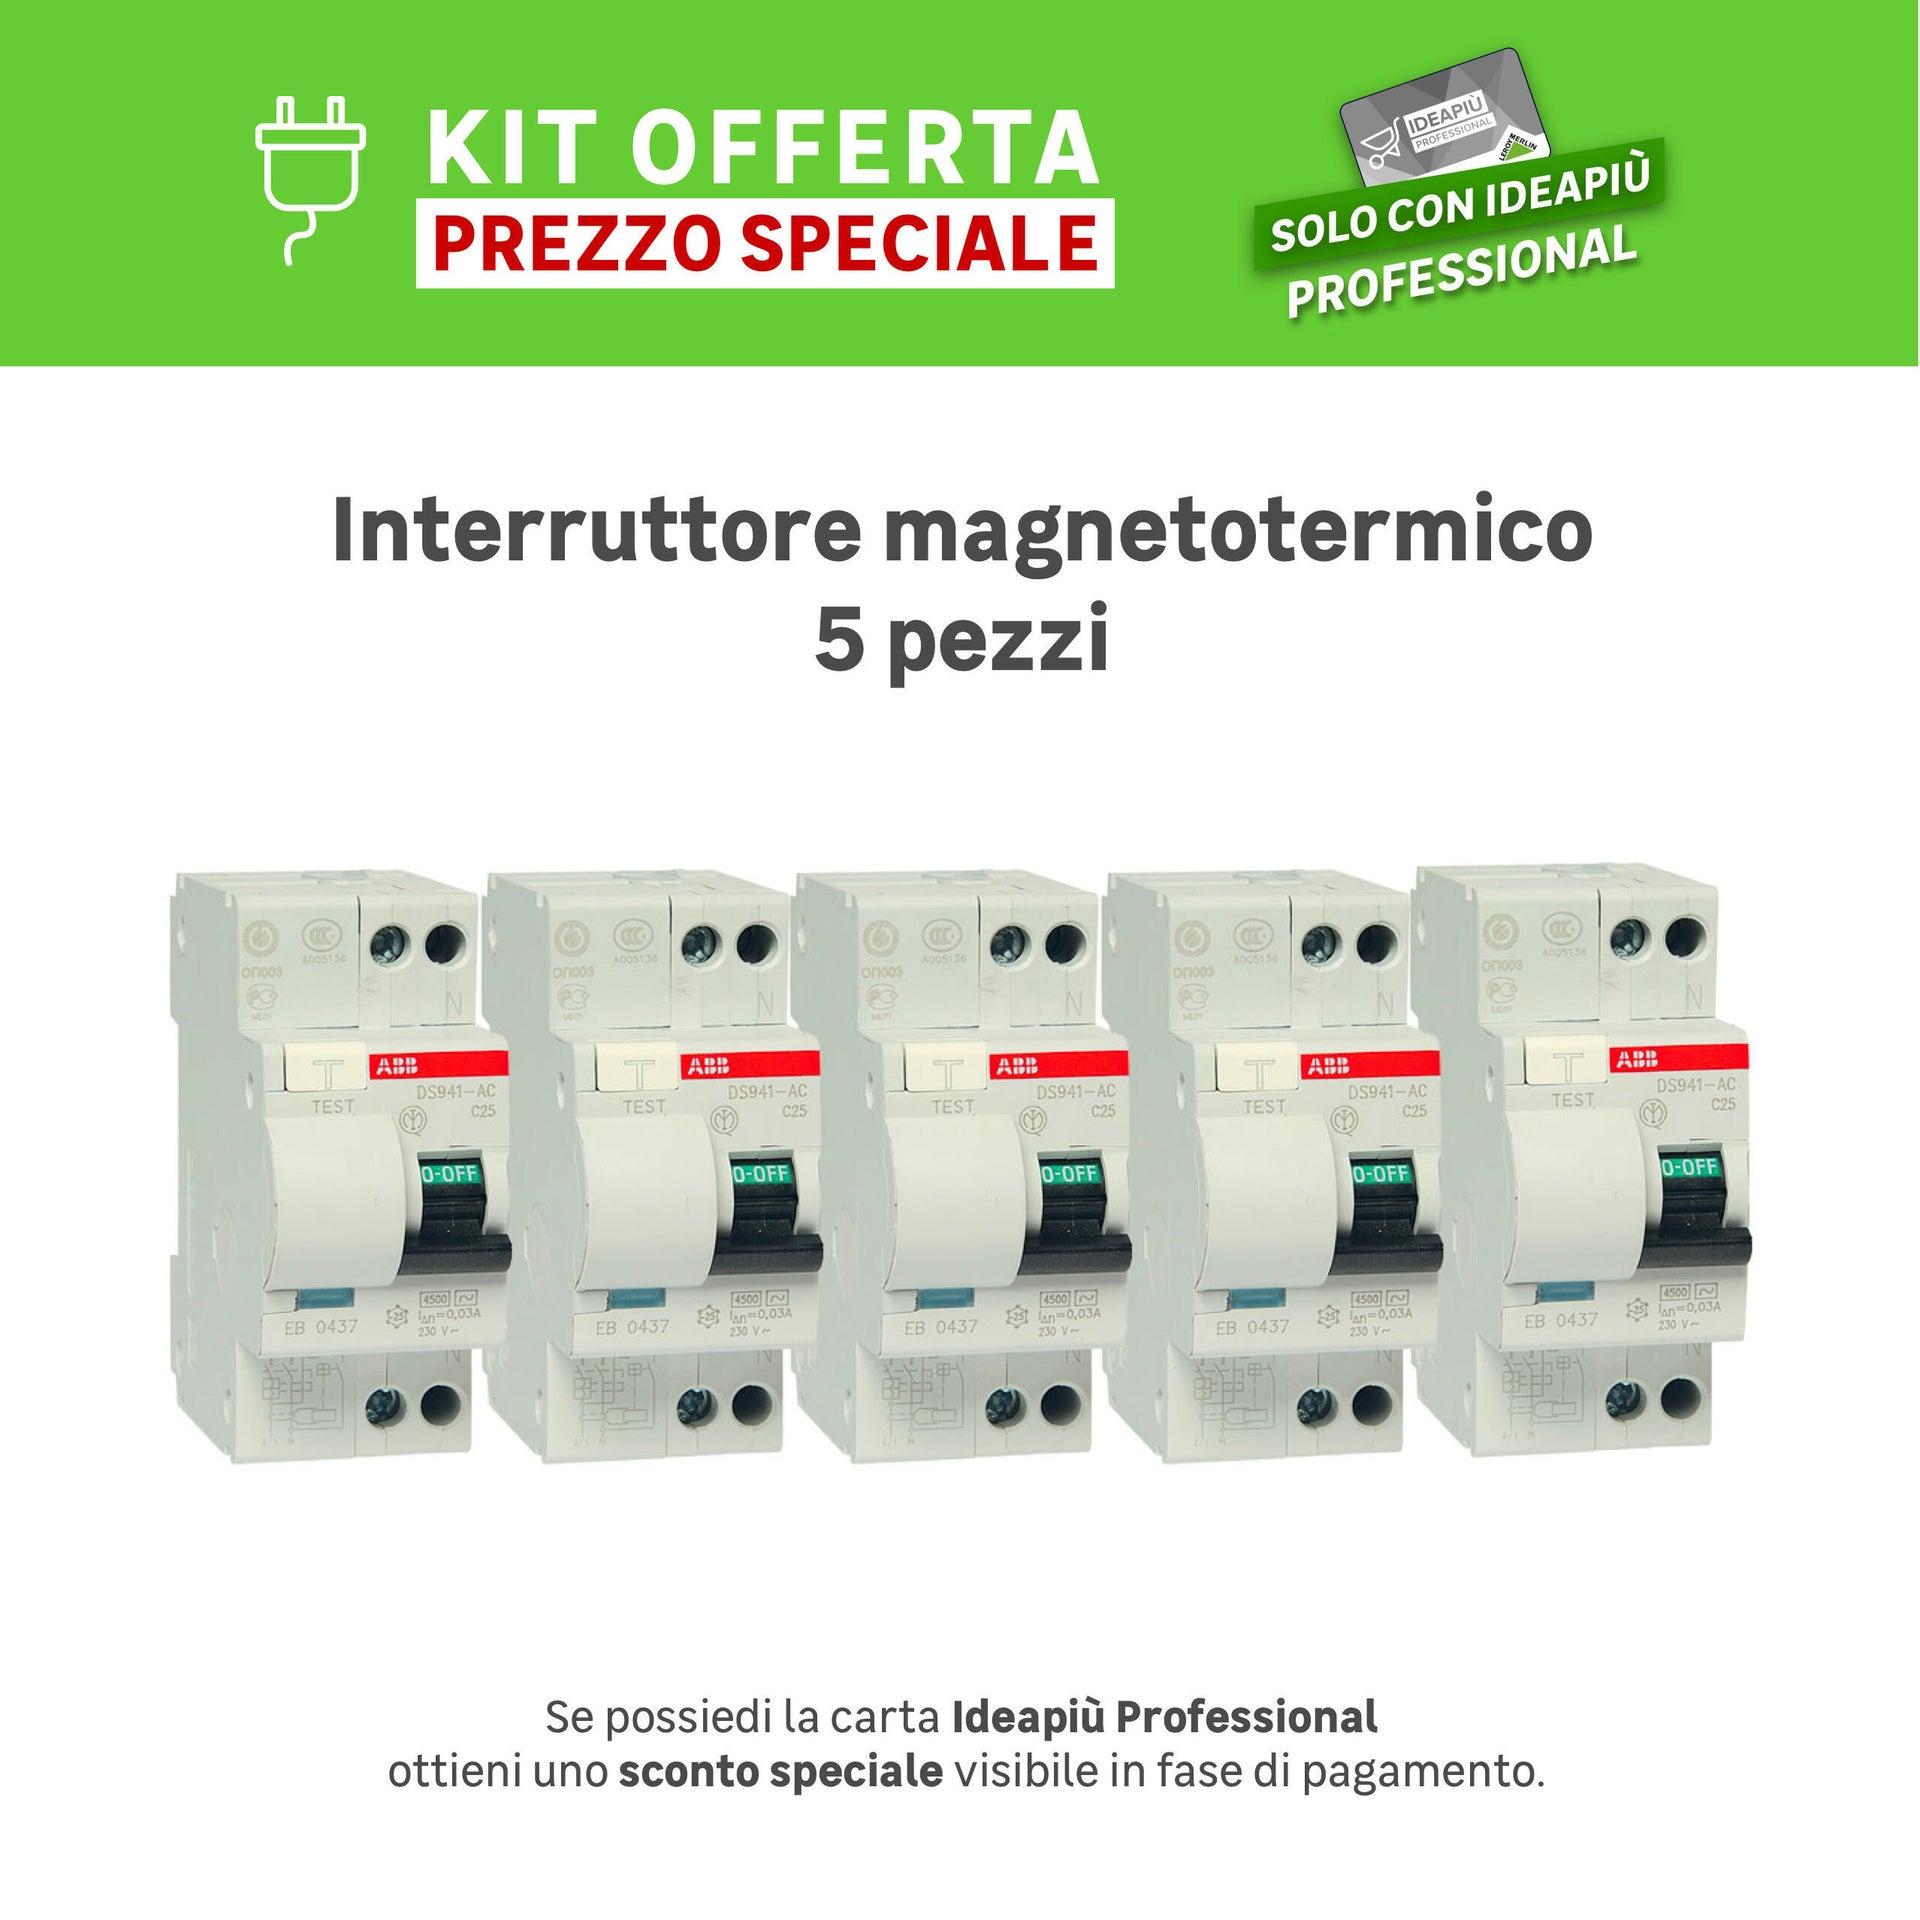 Kit Interruttore magnetotermico differenziale ABB DS 901 1 polo 25A 4.5kA 30mA AC 2 moduli 230V, 5 pezzi - 1